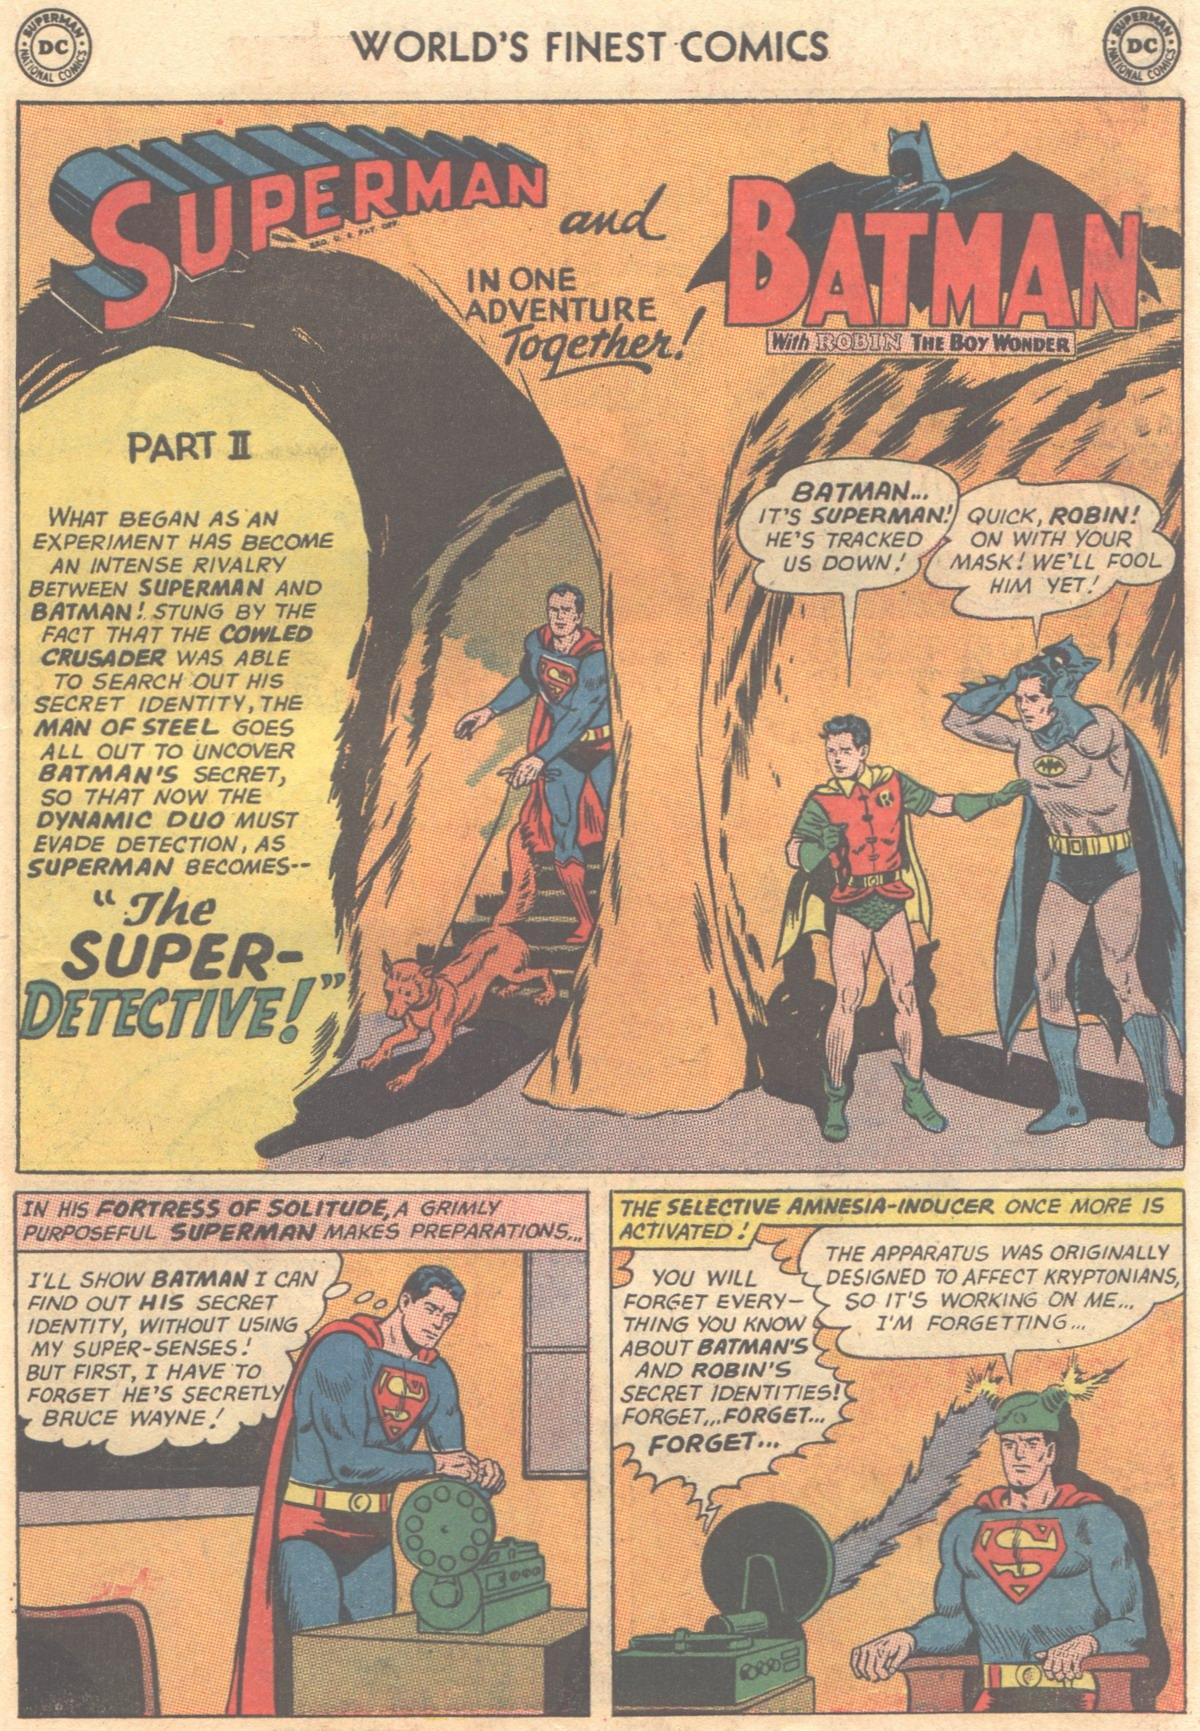 Read online World's Finest Comics comic -  Issue #149 - 15